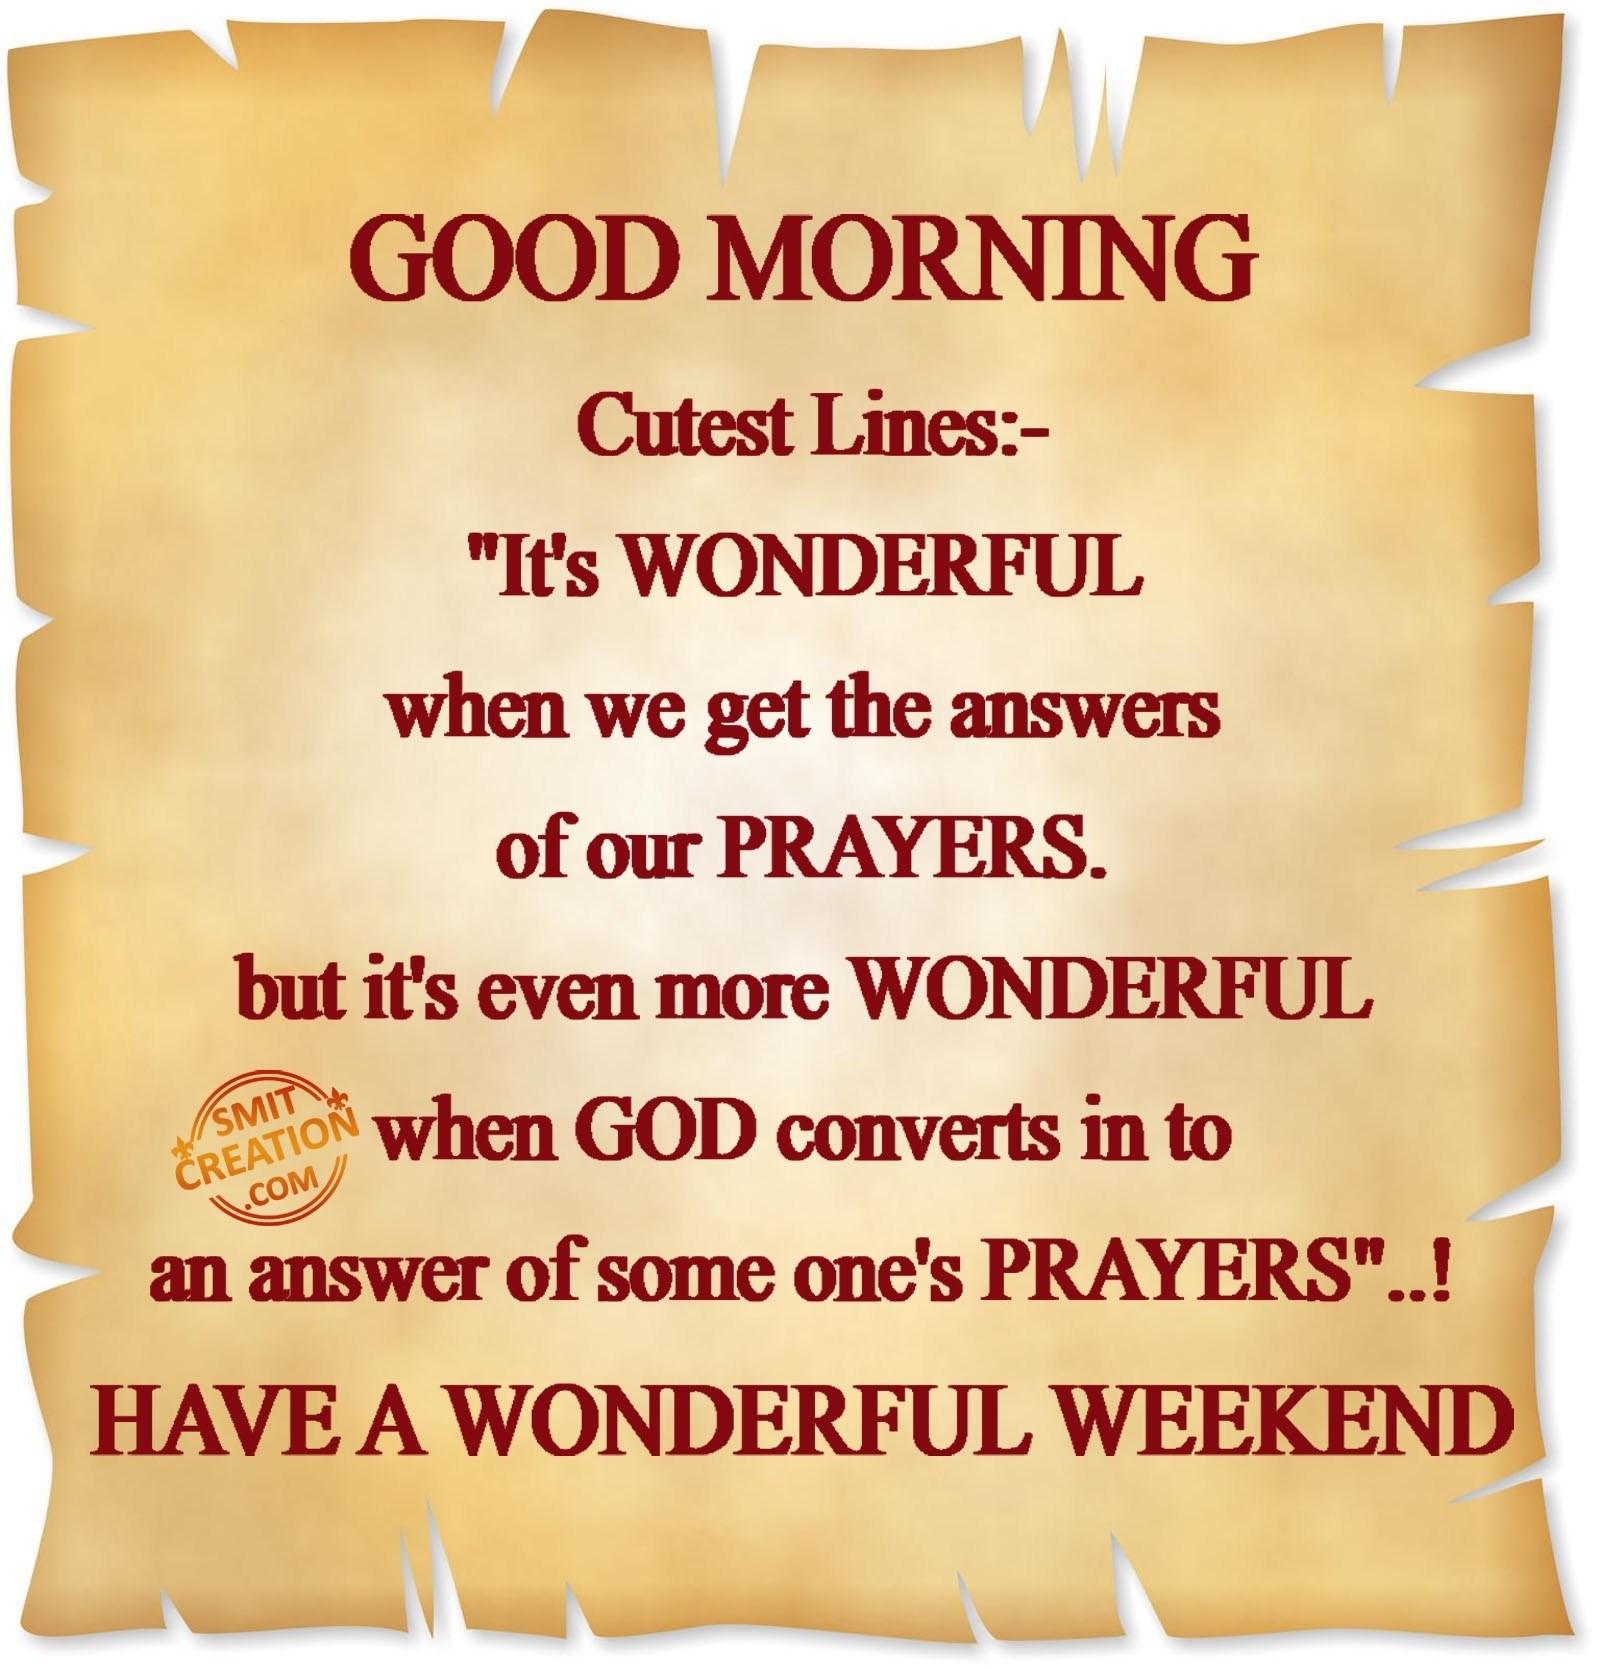 Good Morning Have A Wonderful Weekend Smitcreationcom